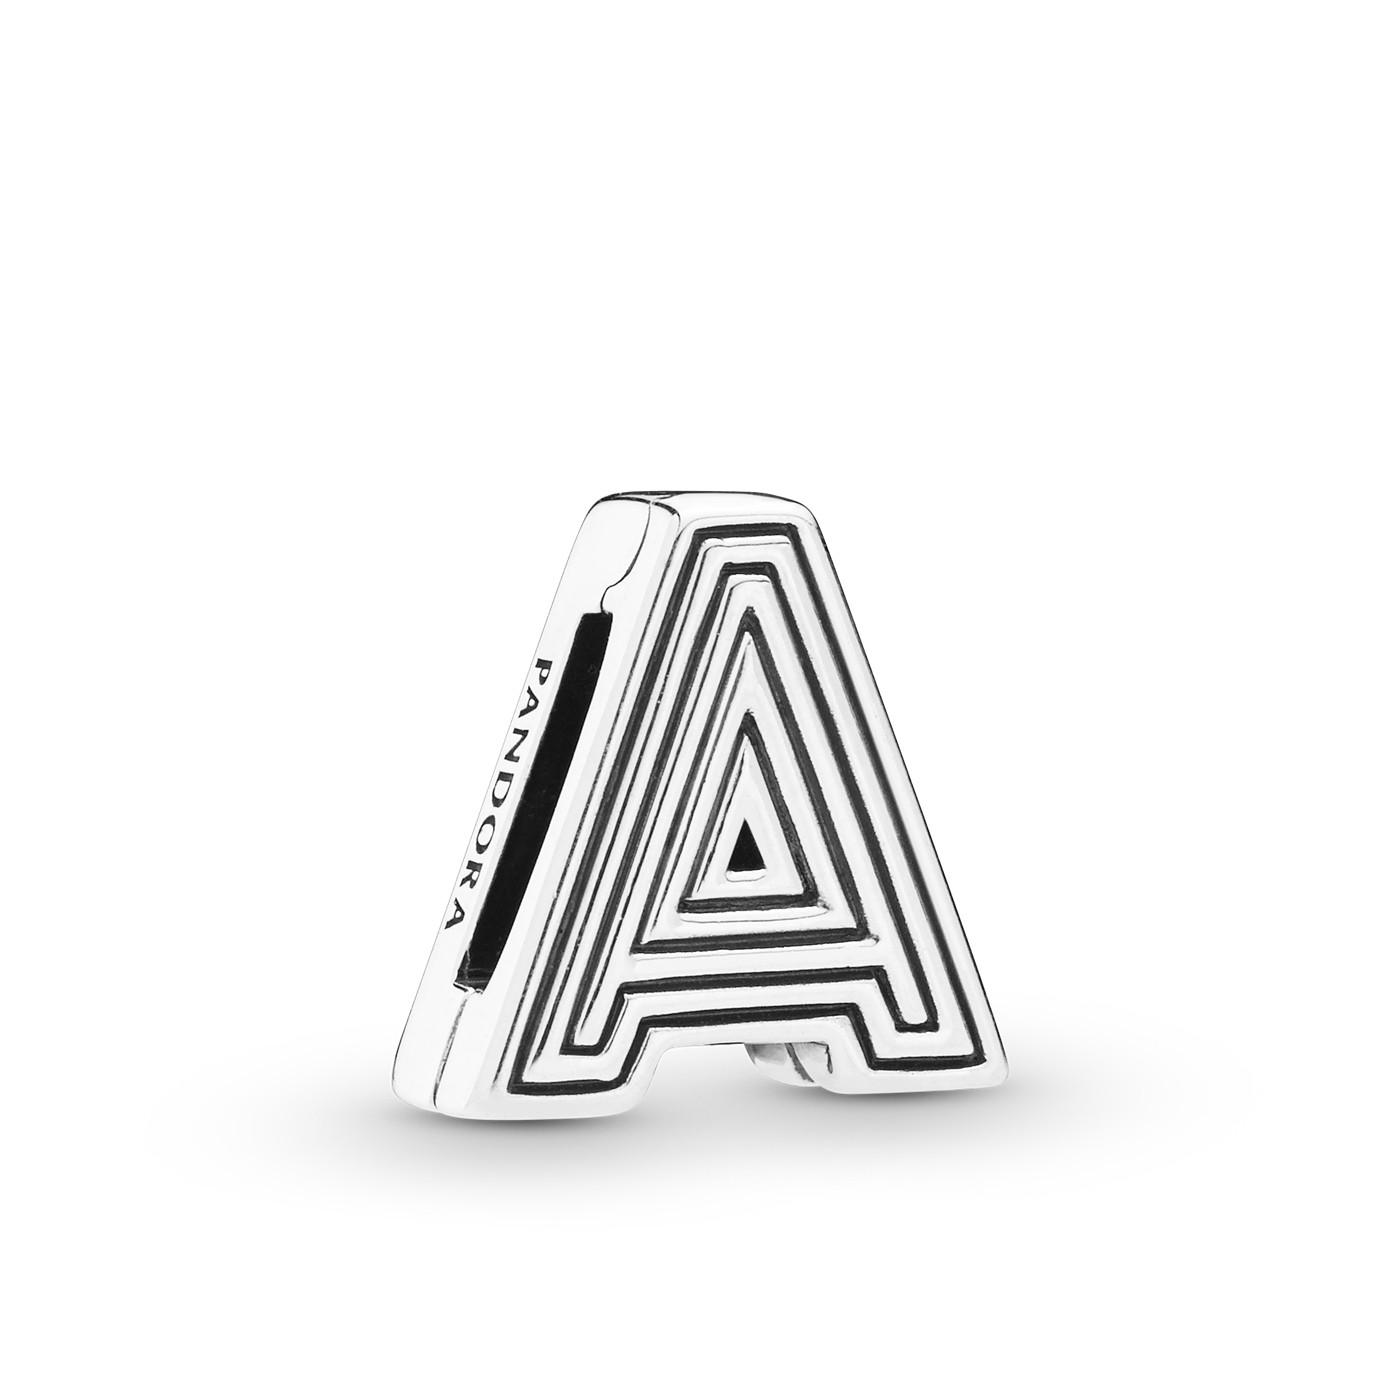 Pandora Reflexions 925 Sterling Zilveren Clip Letter Bedel (Letter: A-T)